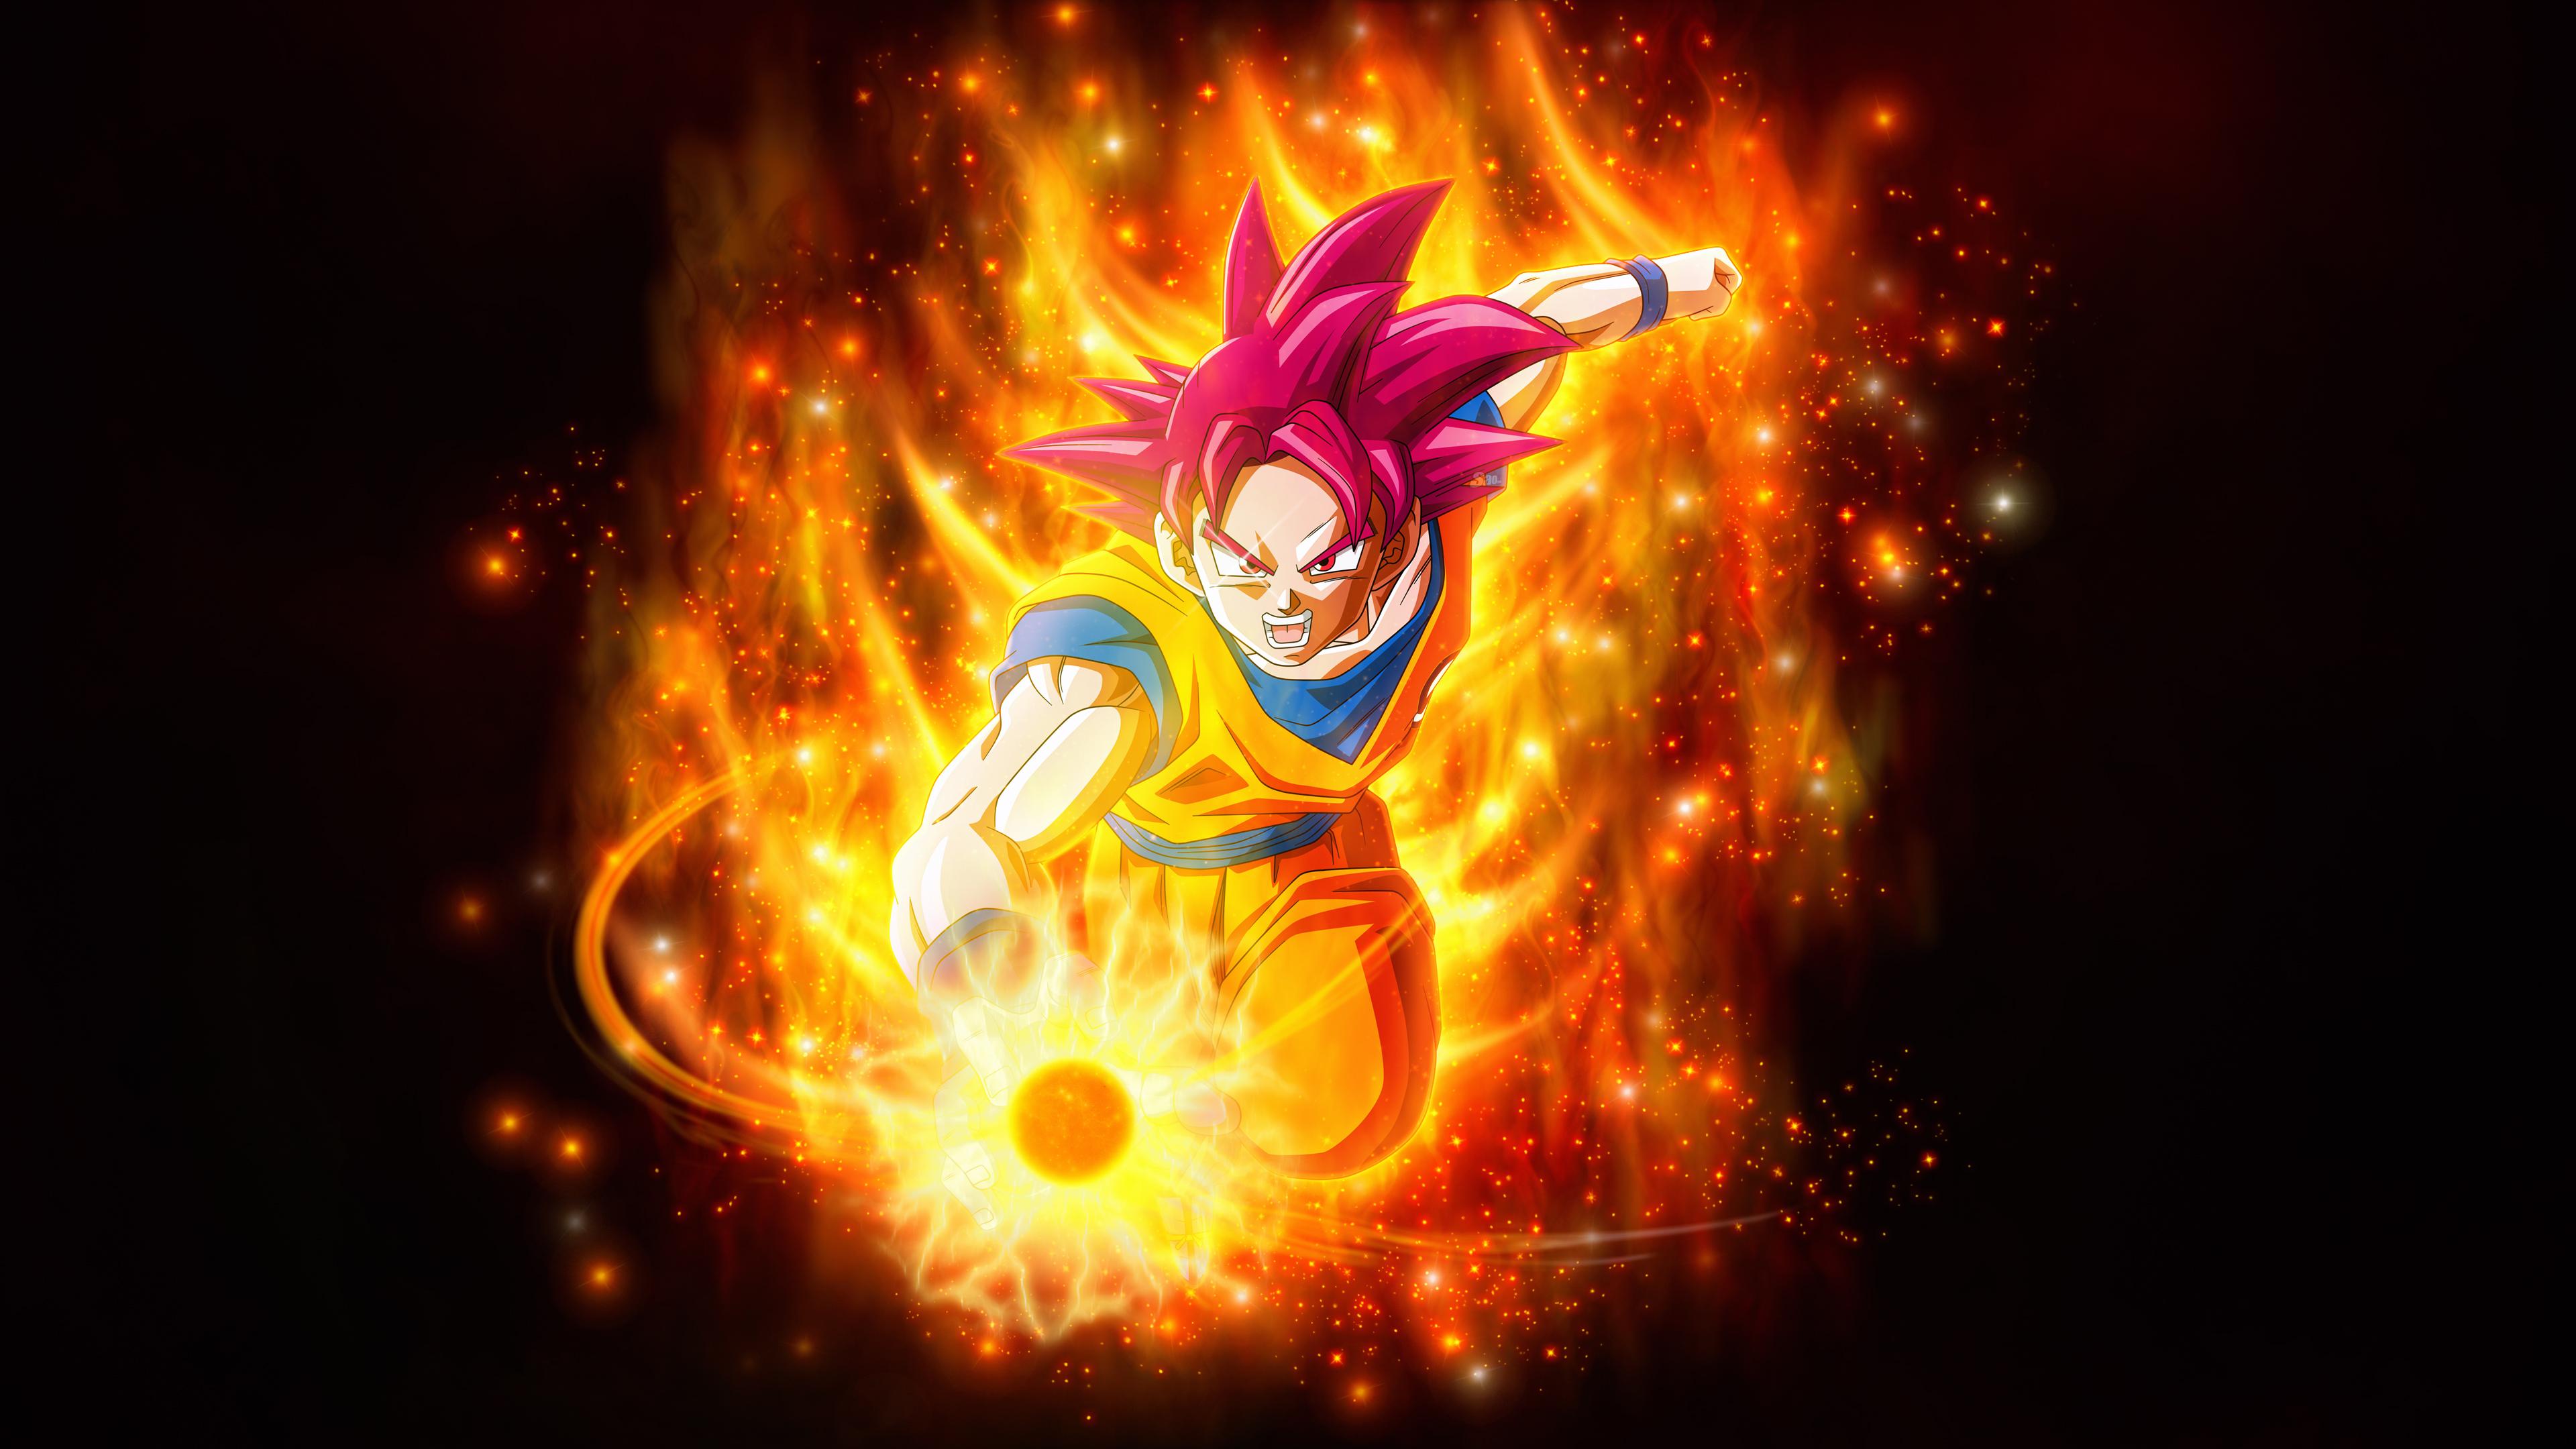 1366x768 dragon ball super super saiyan goku 1366x768 - Goku wallpaper 4k ...